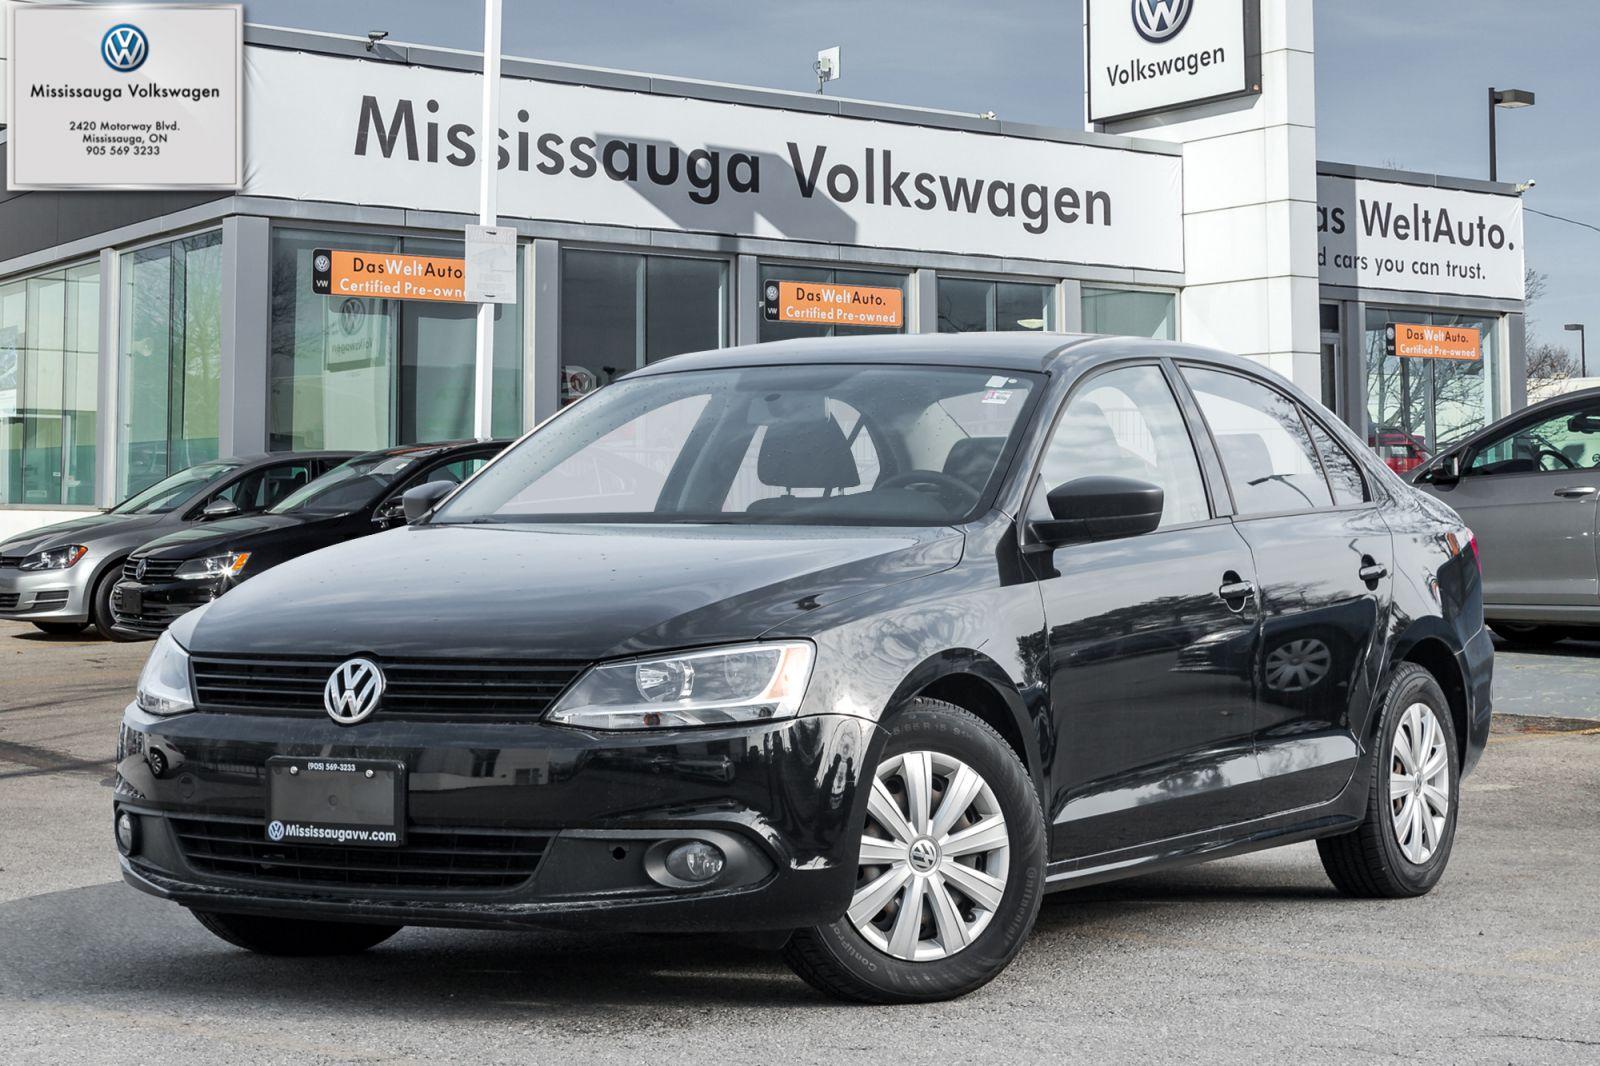 2011 Volkswagen Jetta Sedan Image